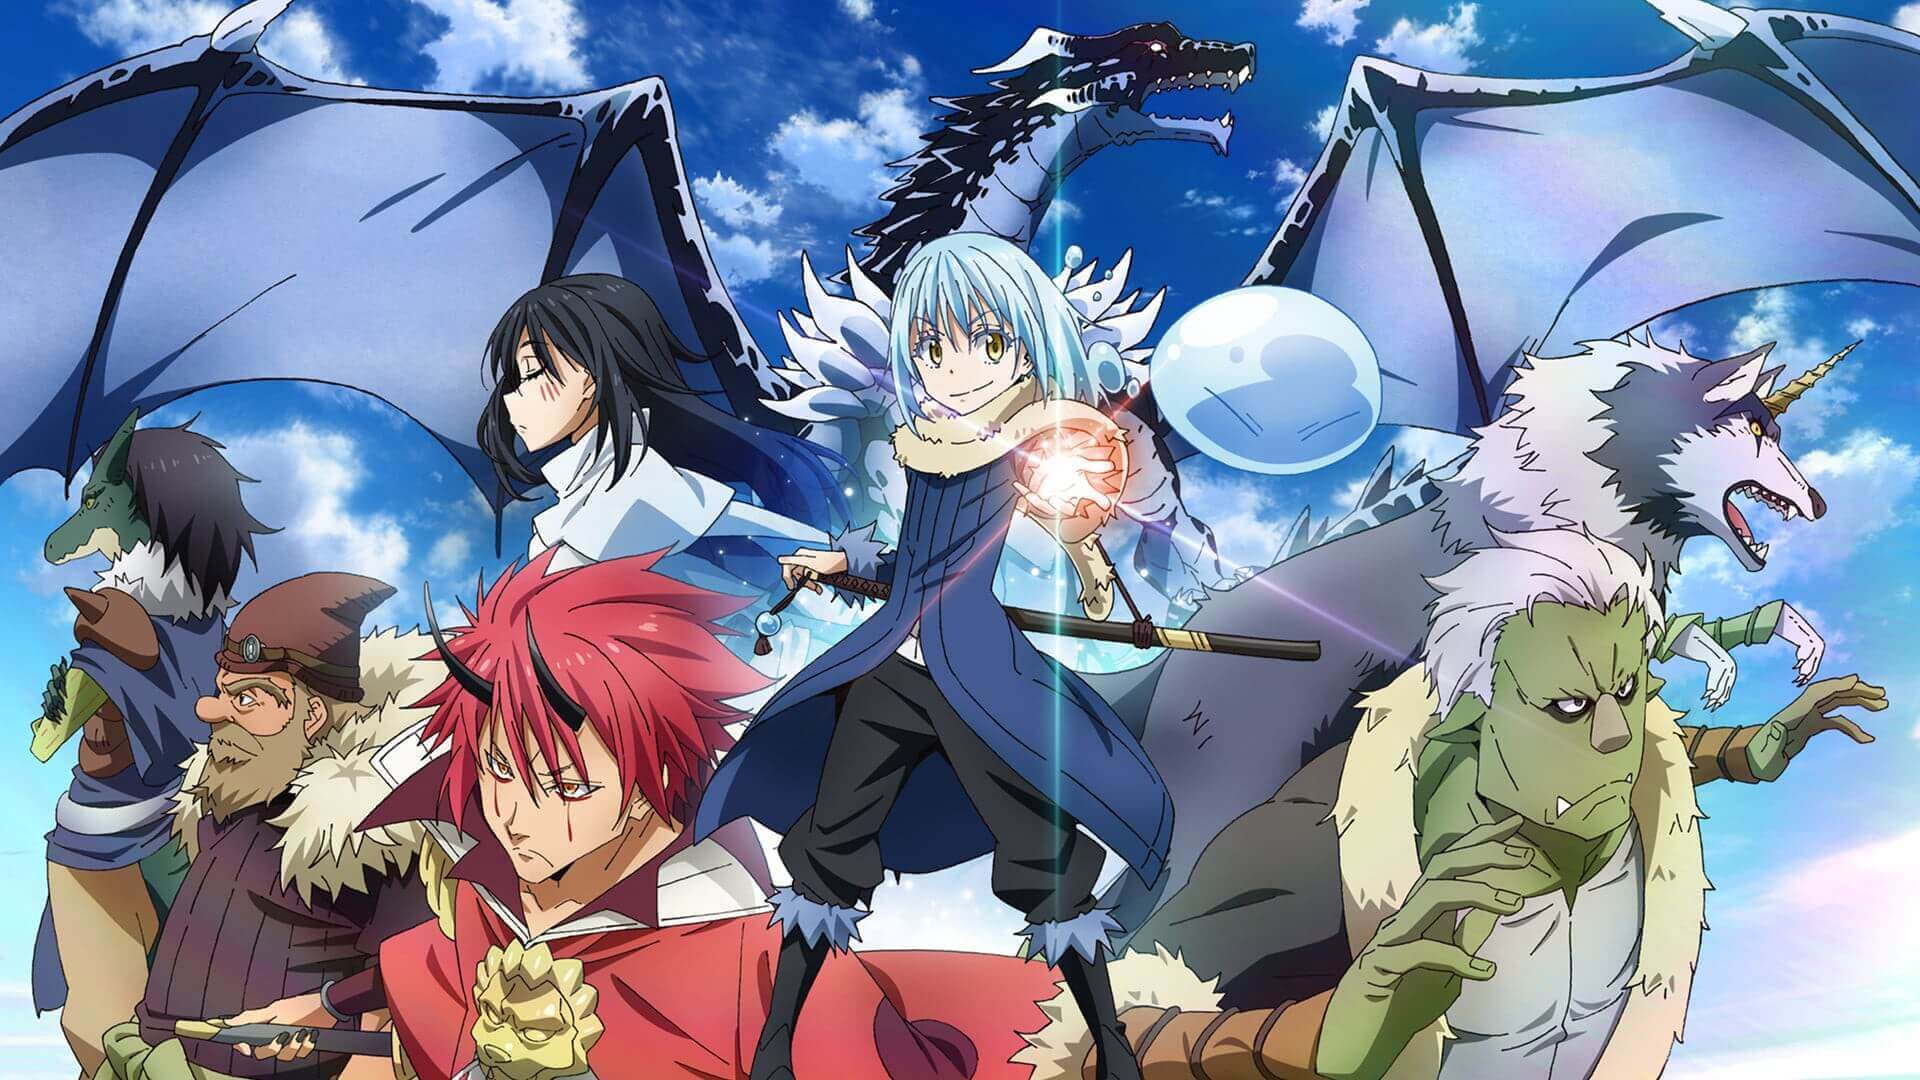 Anime Tensei Shitara Slime datta ken desktop background